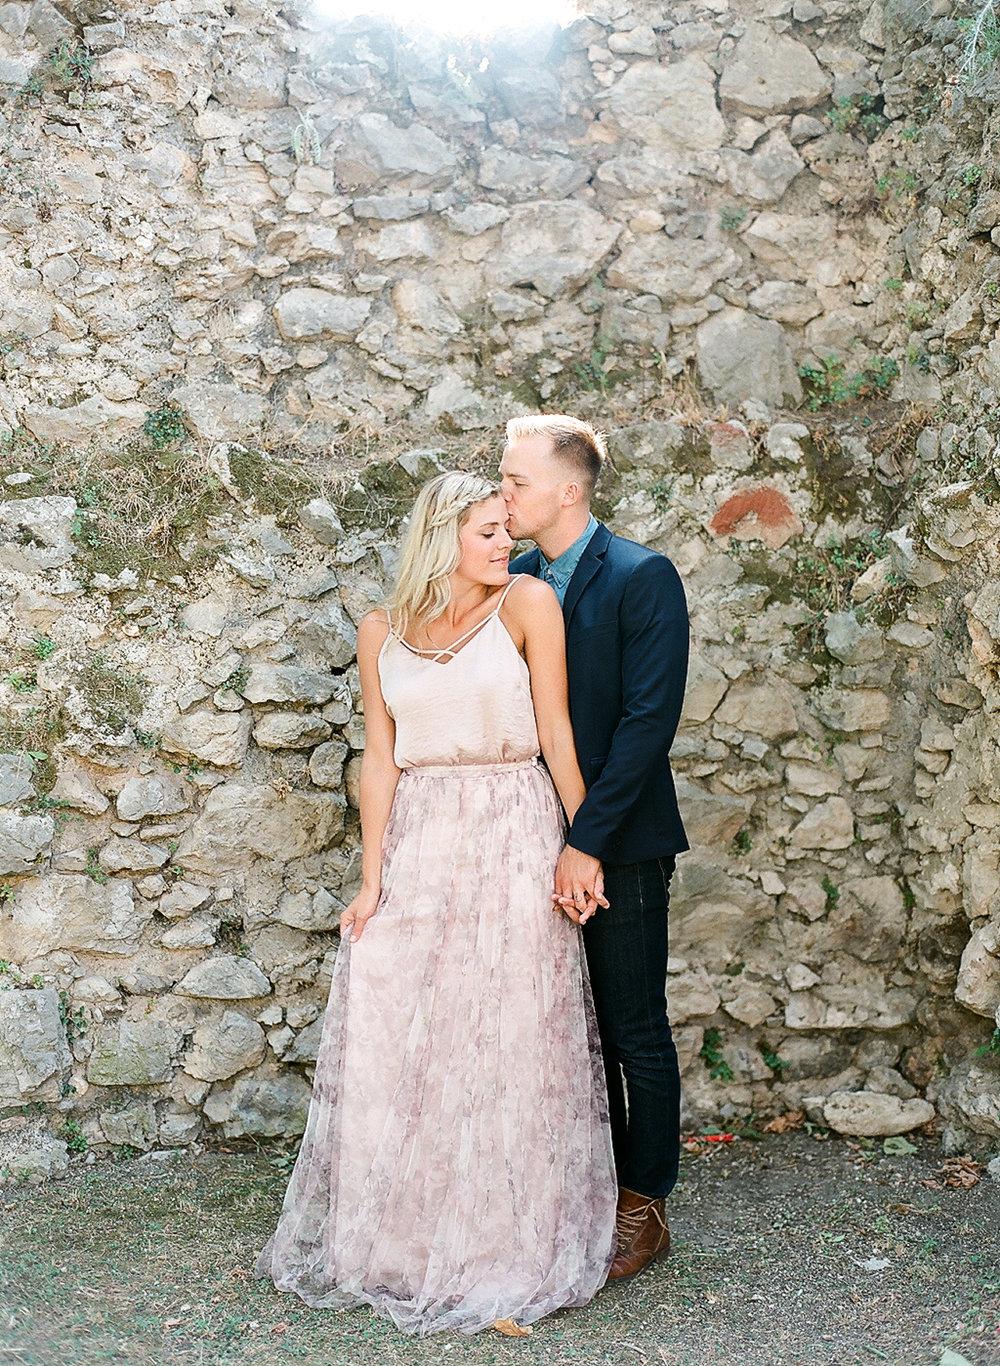 Bonphotage Ravello Italy Fine Art Wedding Photography